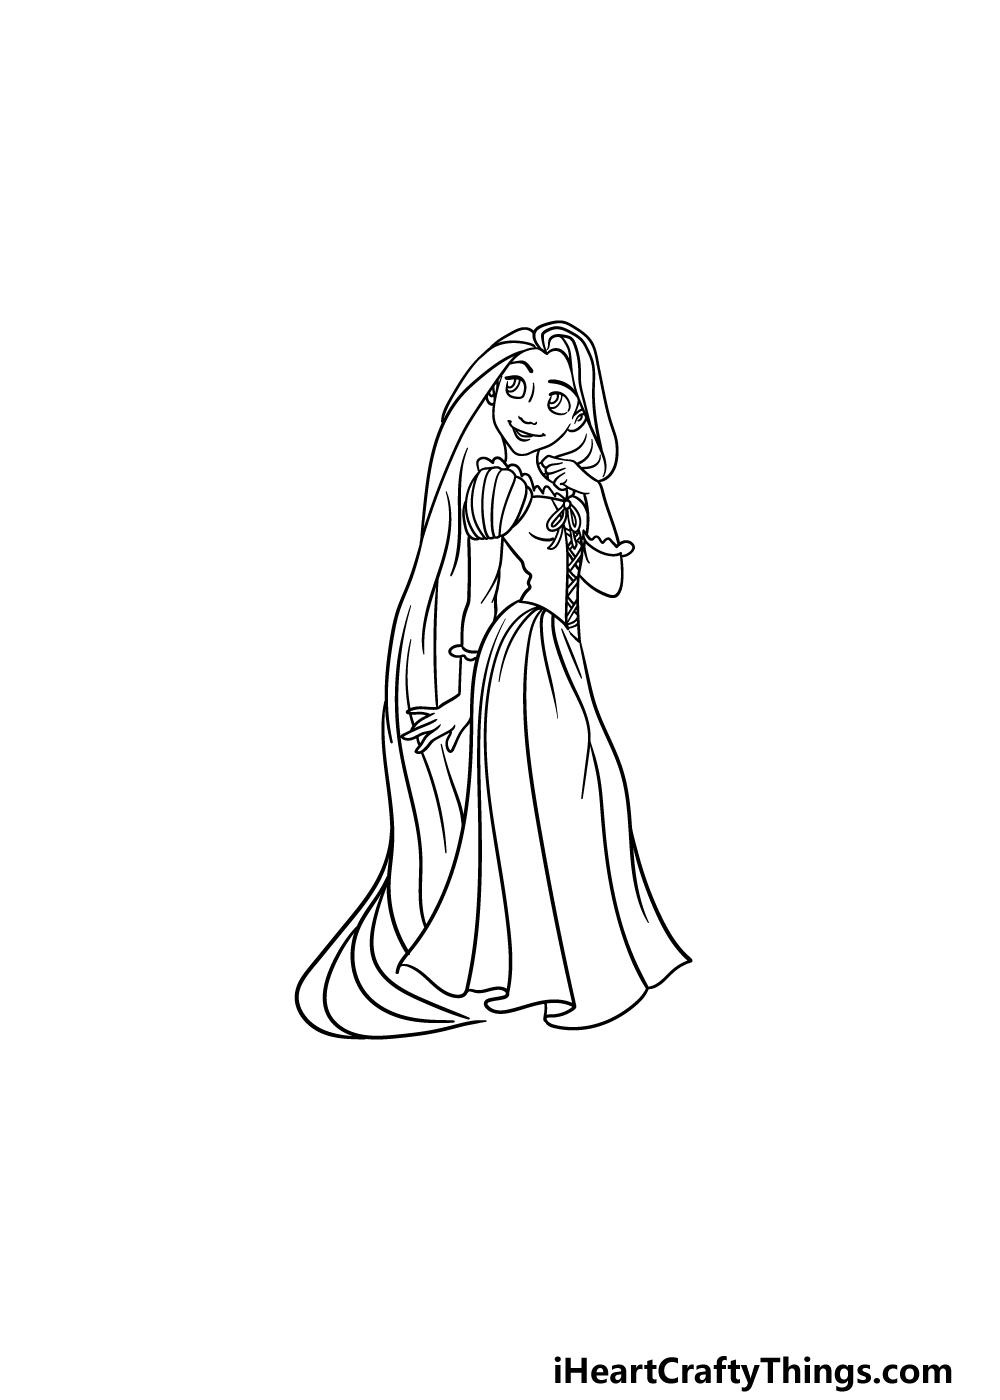 drawing Rapunzel step 6